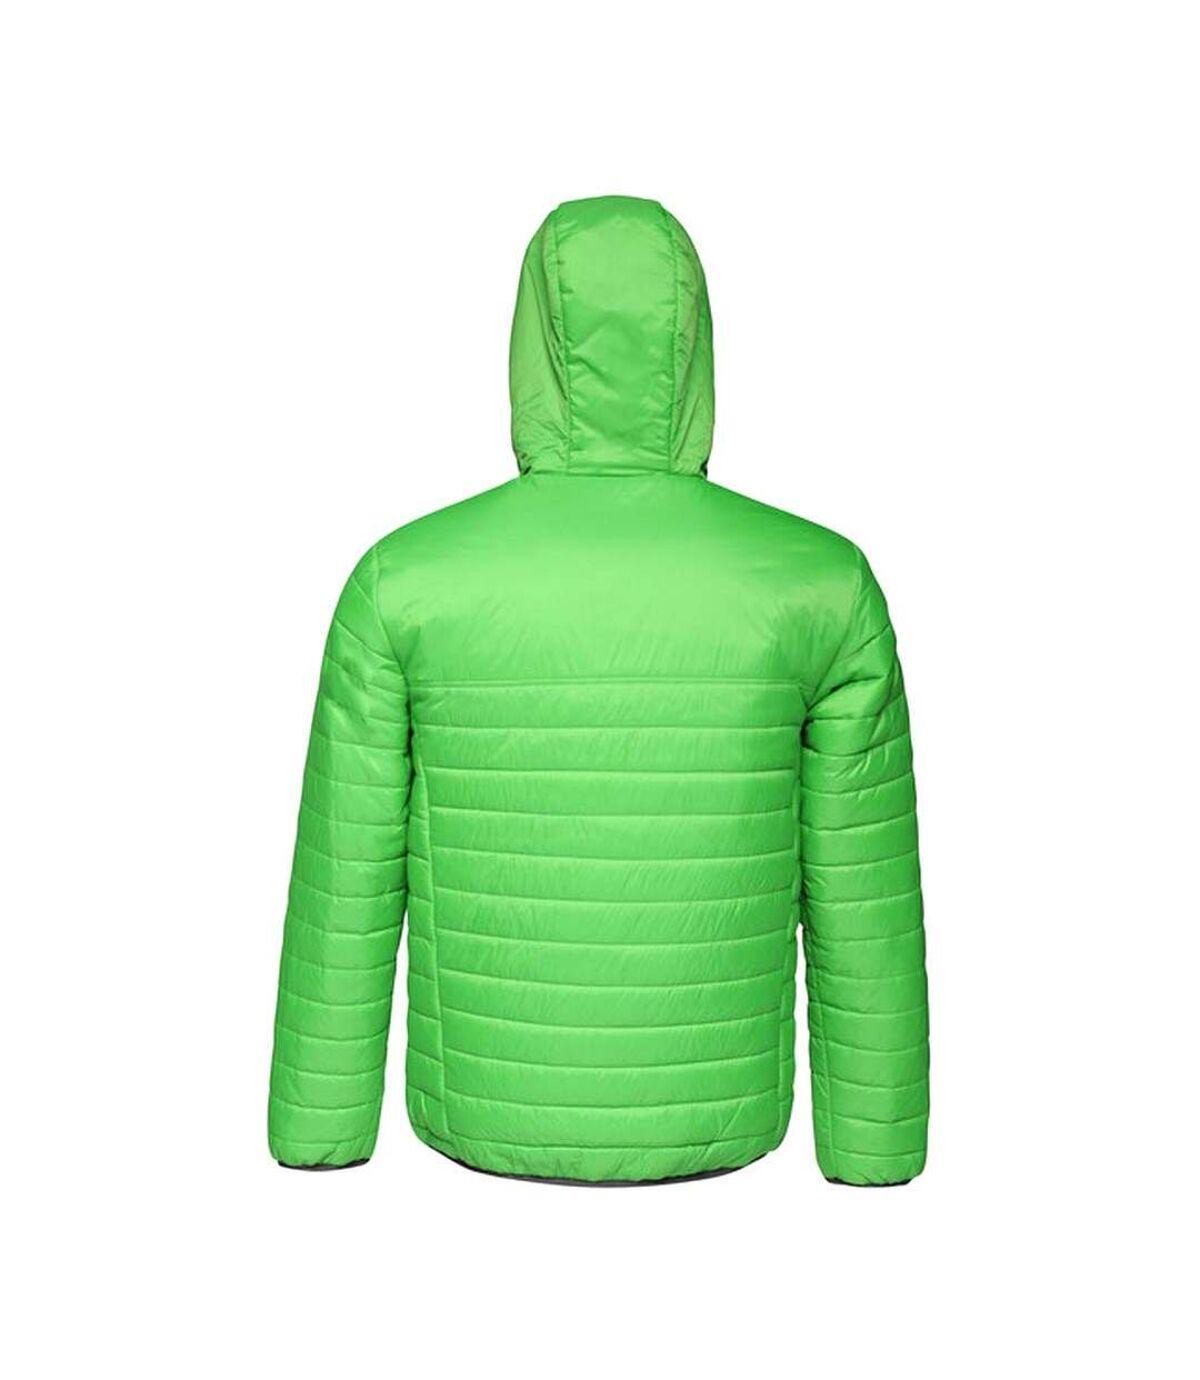 Regatta Mens Acadia II Hooded Jacket (Pure Green/Jet Black) - UTRG3745